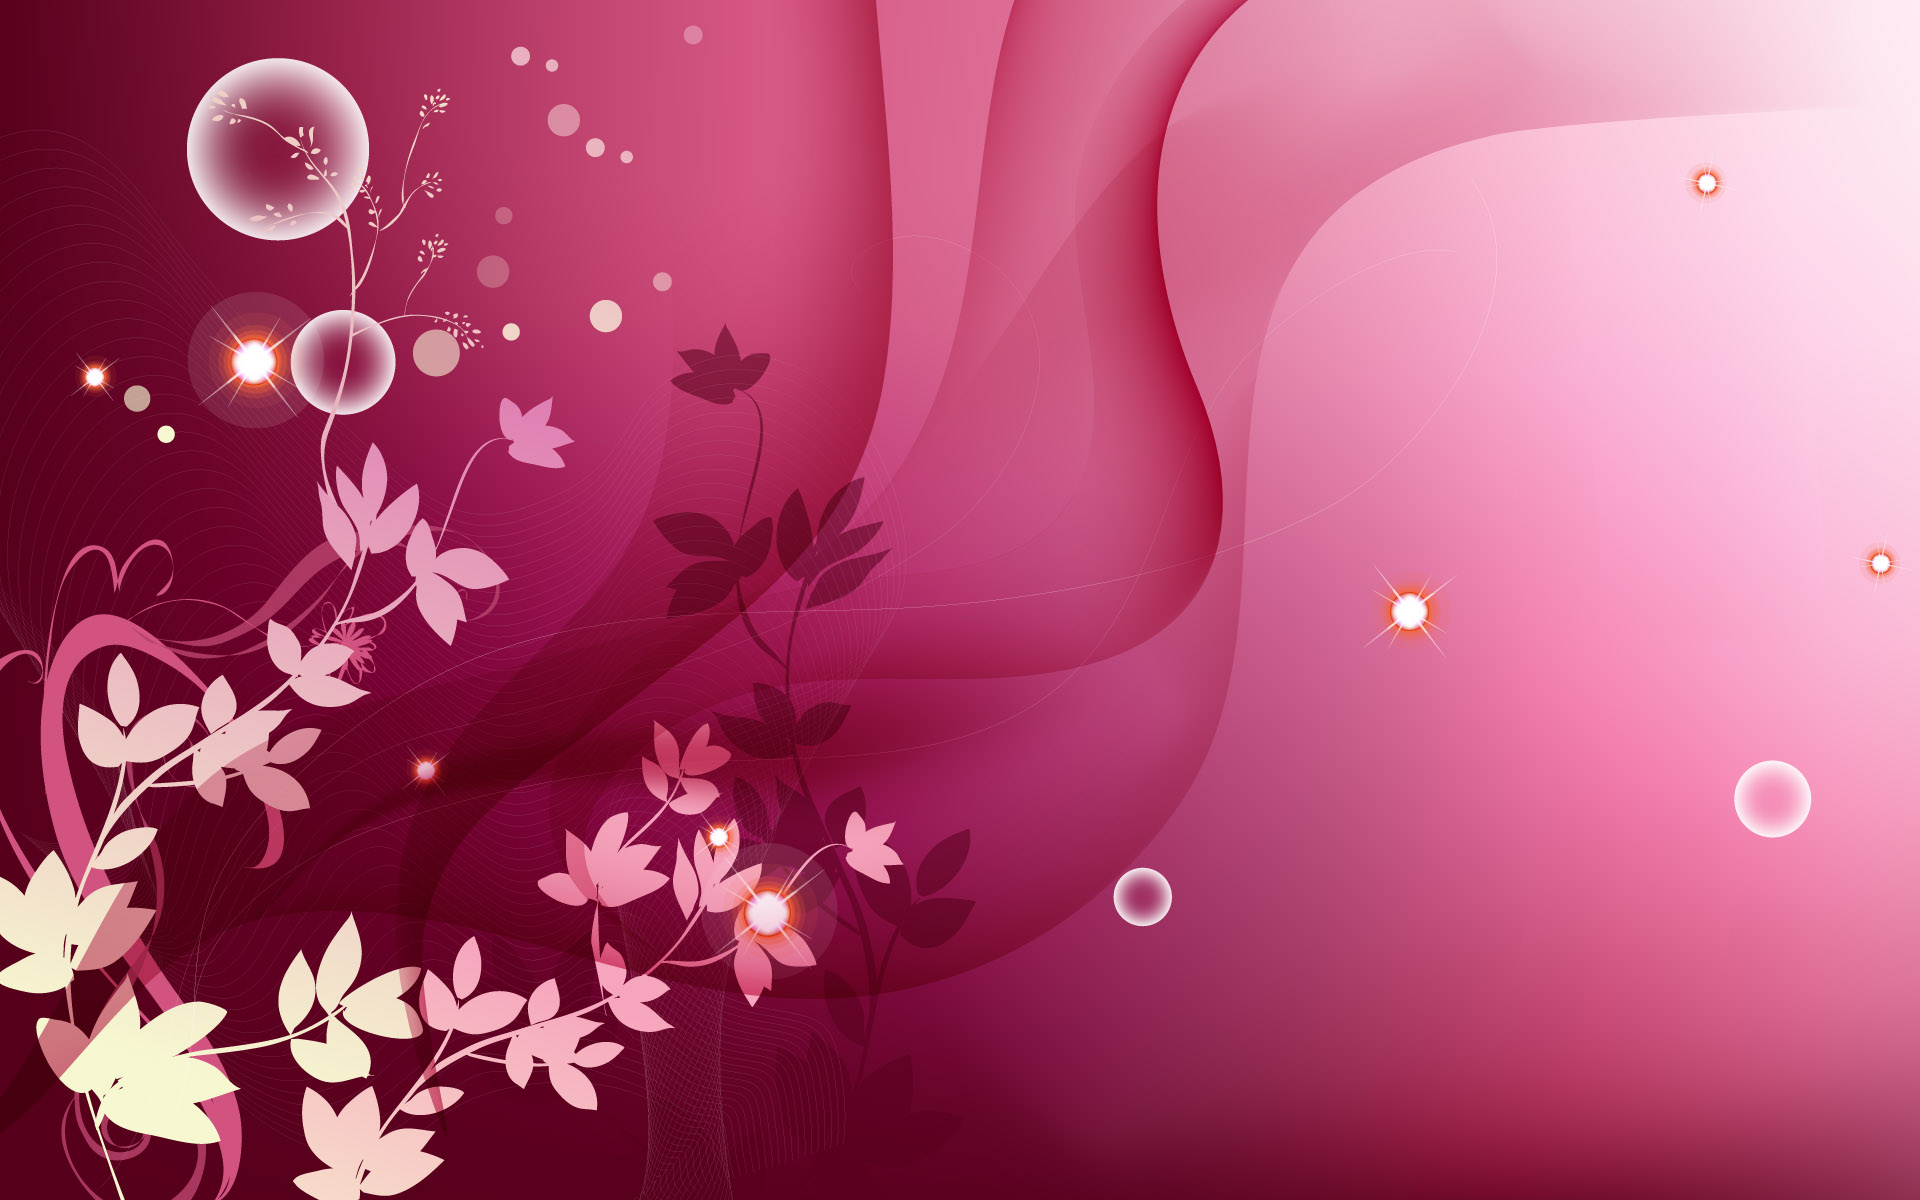 46 Cute Pink Wallpapers For Girls On Wallpapersafari